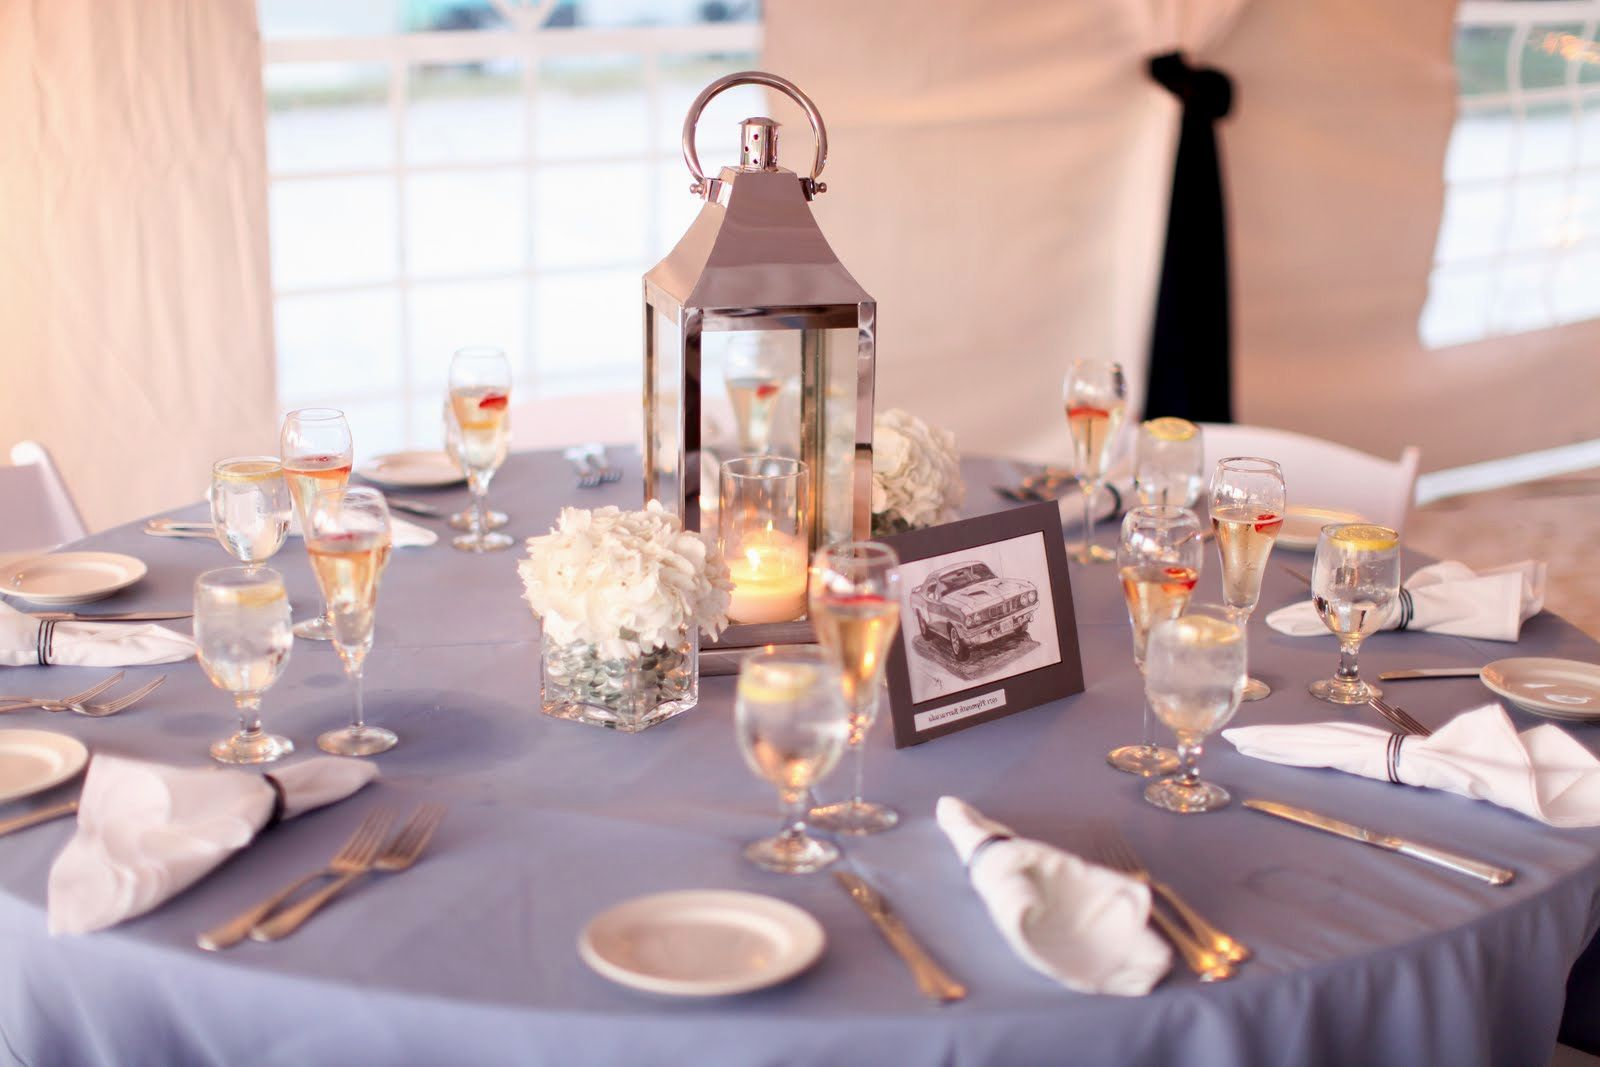 Simple E Wedding Reception Table Decorations No Centerpiece Lg Have Wedding Reception Table Decorations Simple Wedding Decorations Simple Wedding Table Centerpieces Wedding Decor Elegant